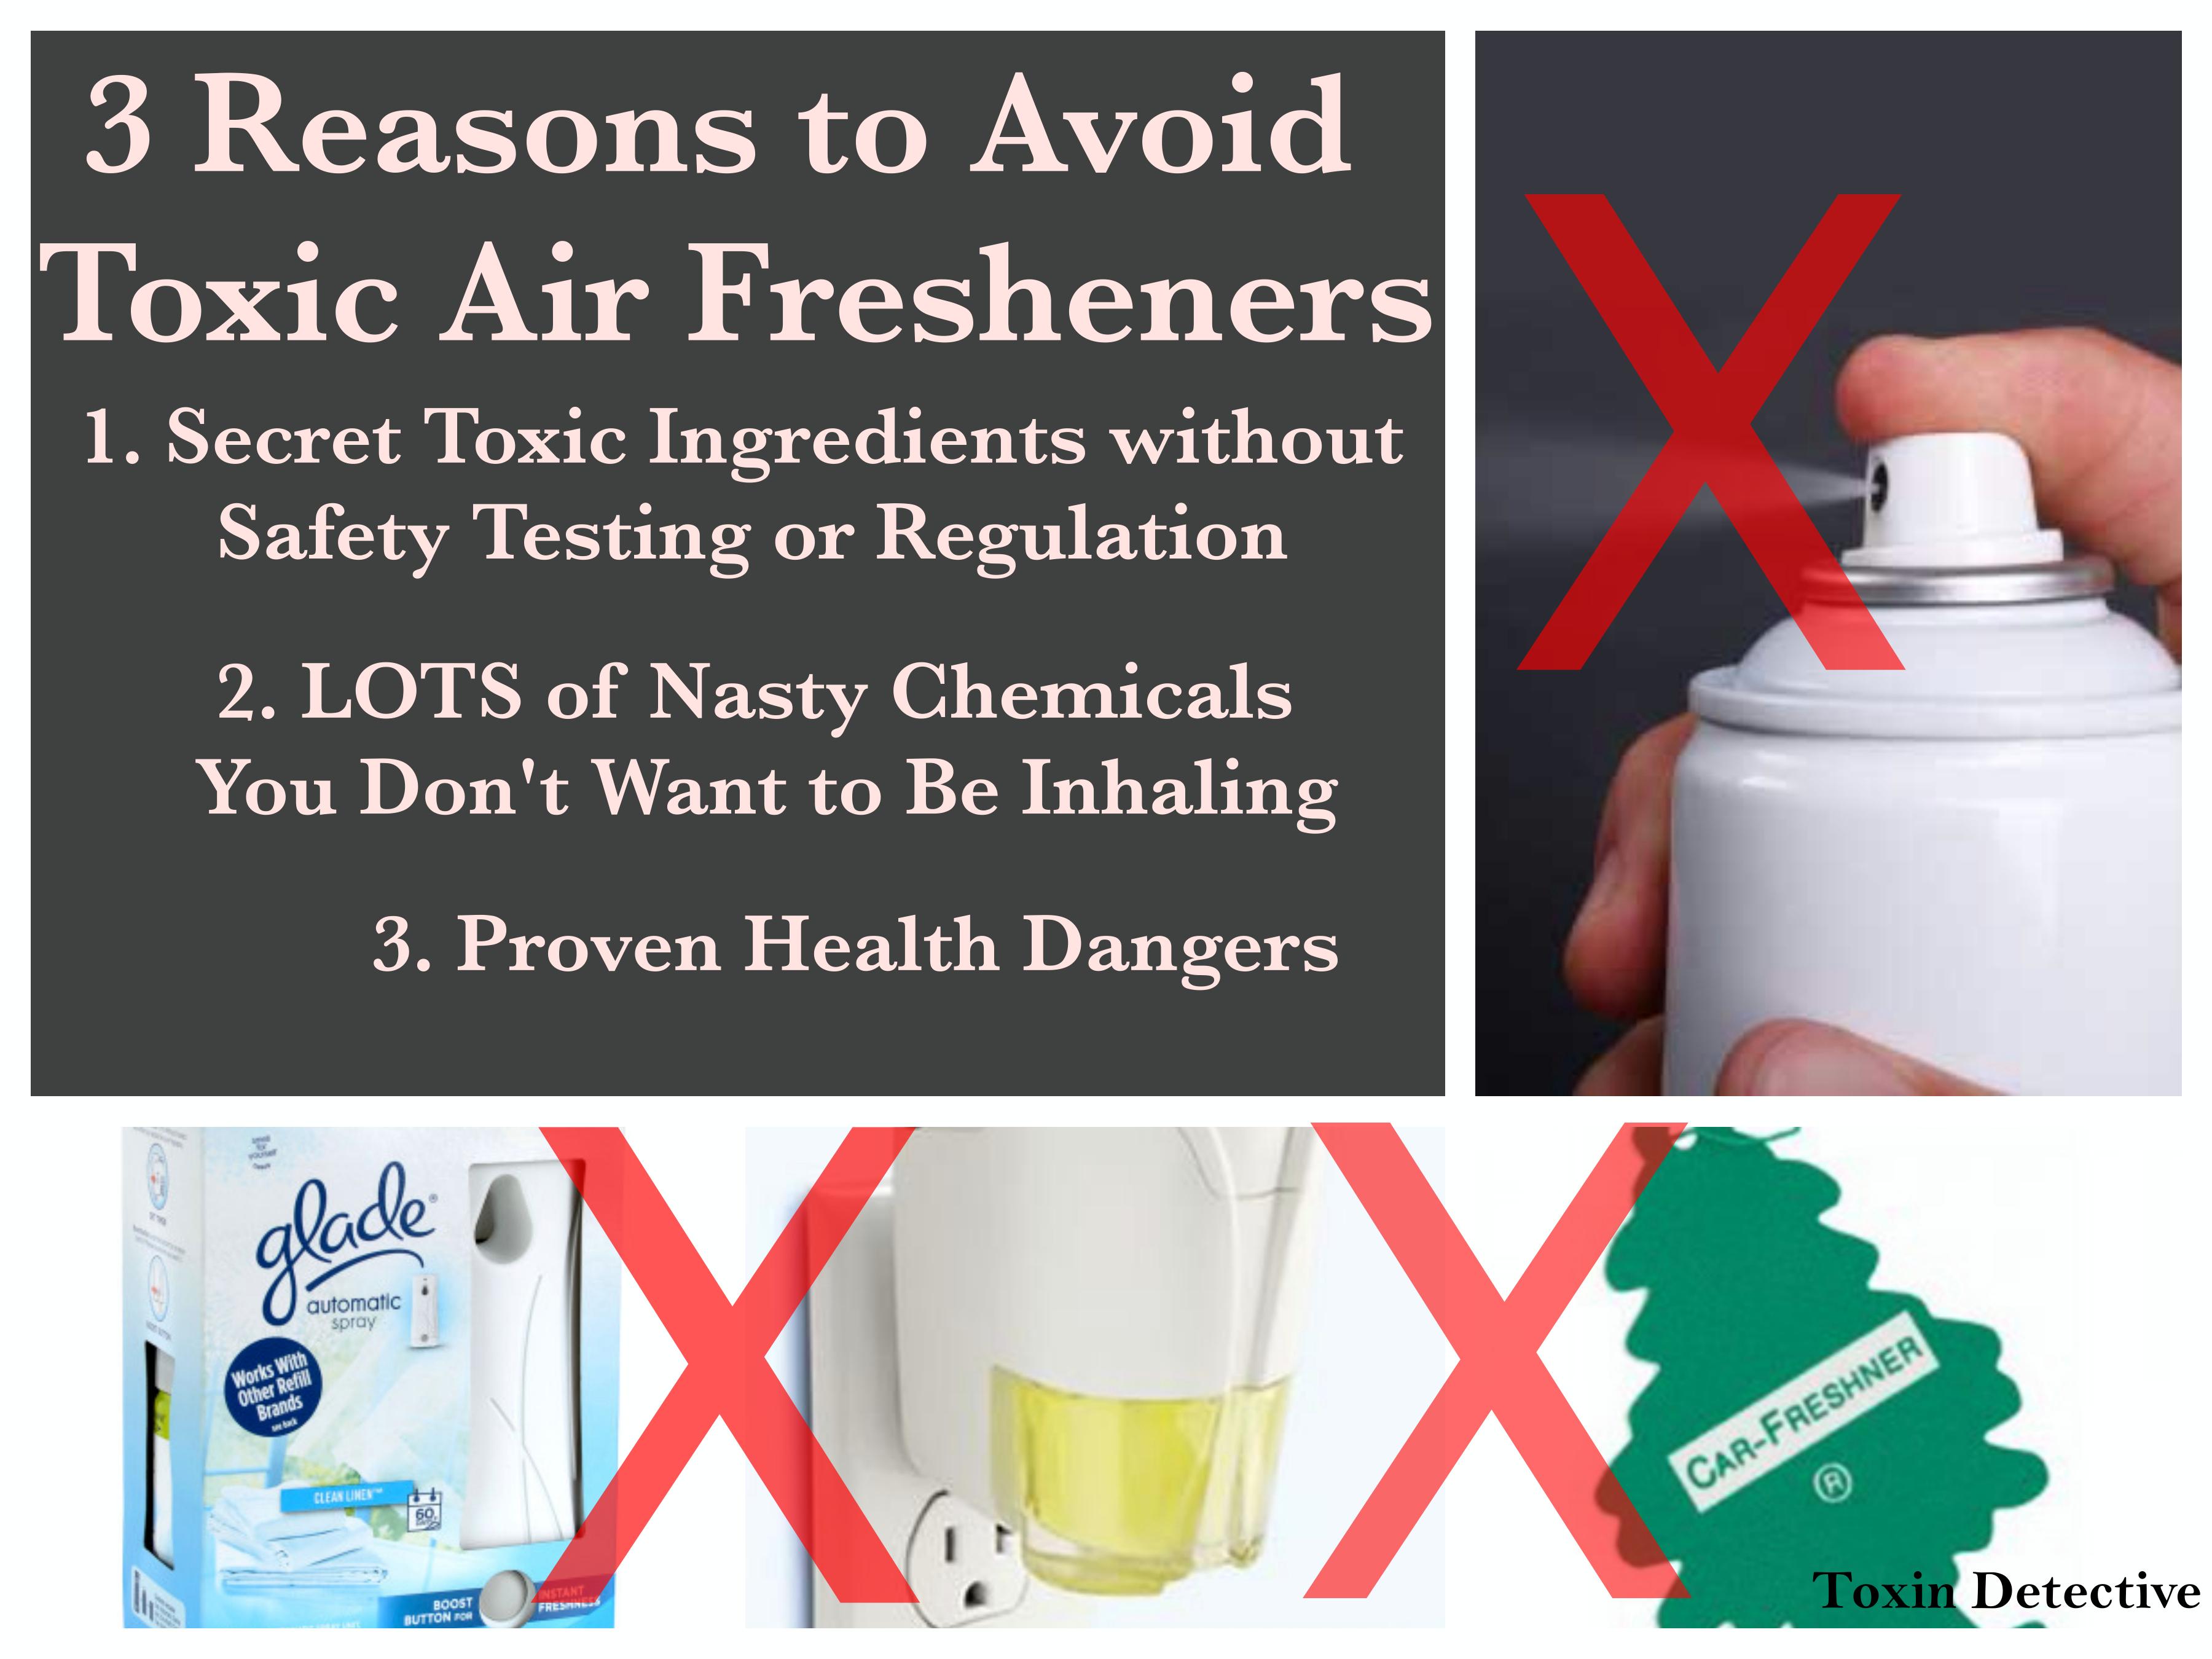 Toxic clipart air freshener To Fresheners Avoid Reasons 3